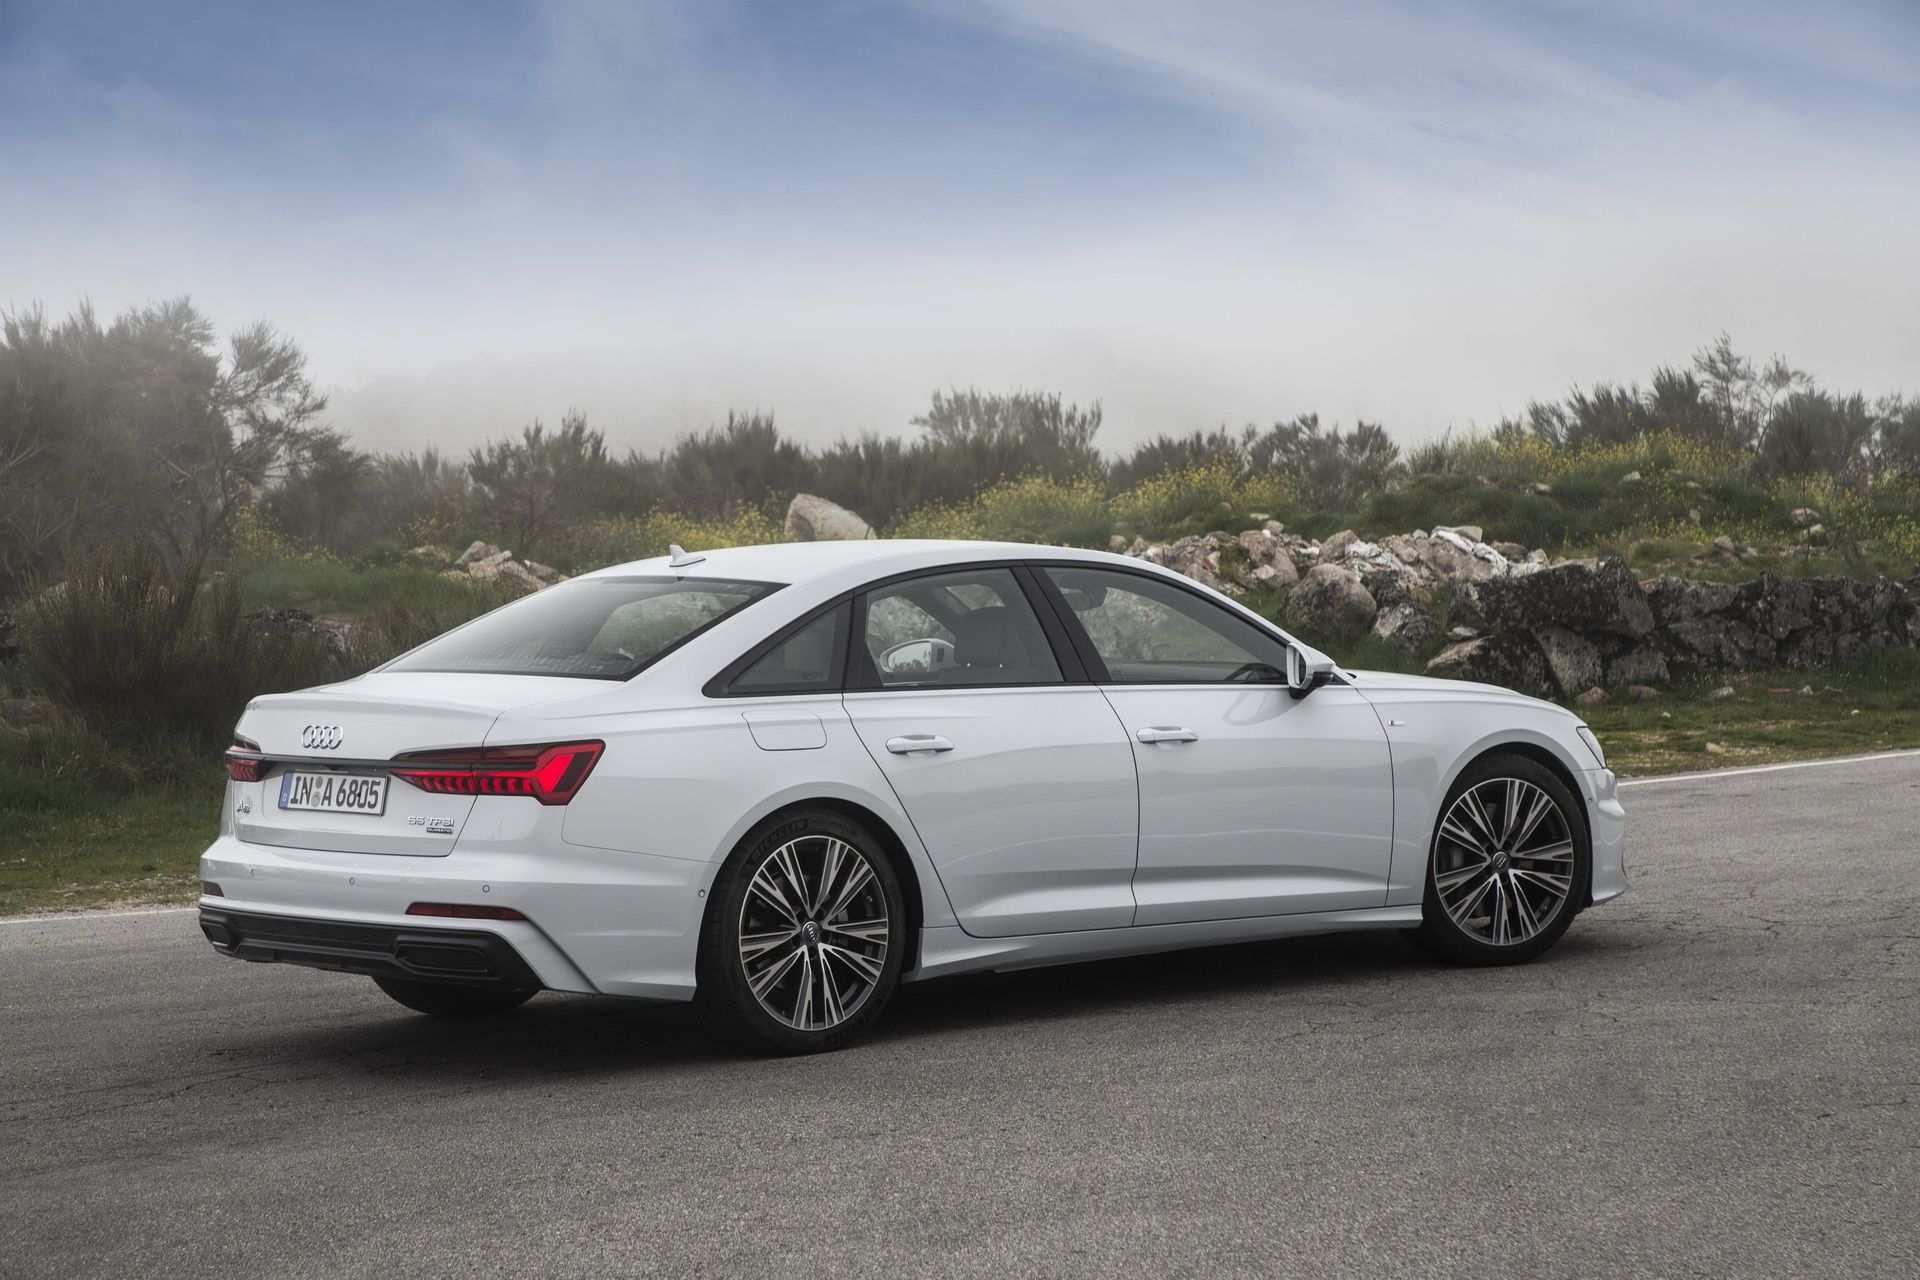 17 Great 2019 Audi Tdi Picture by 2019 Audi Tdi